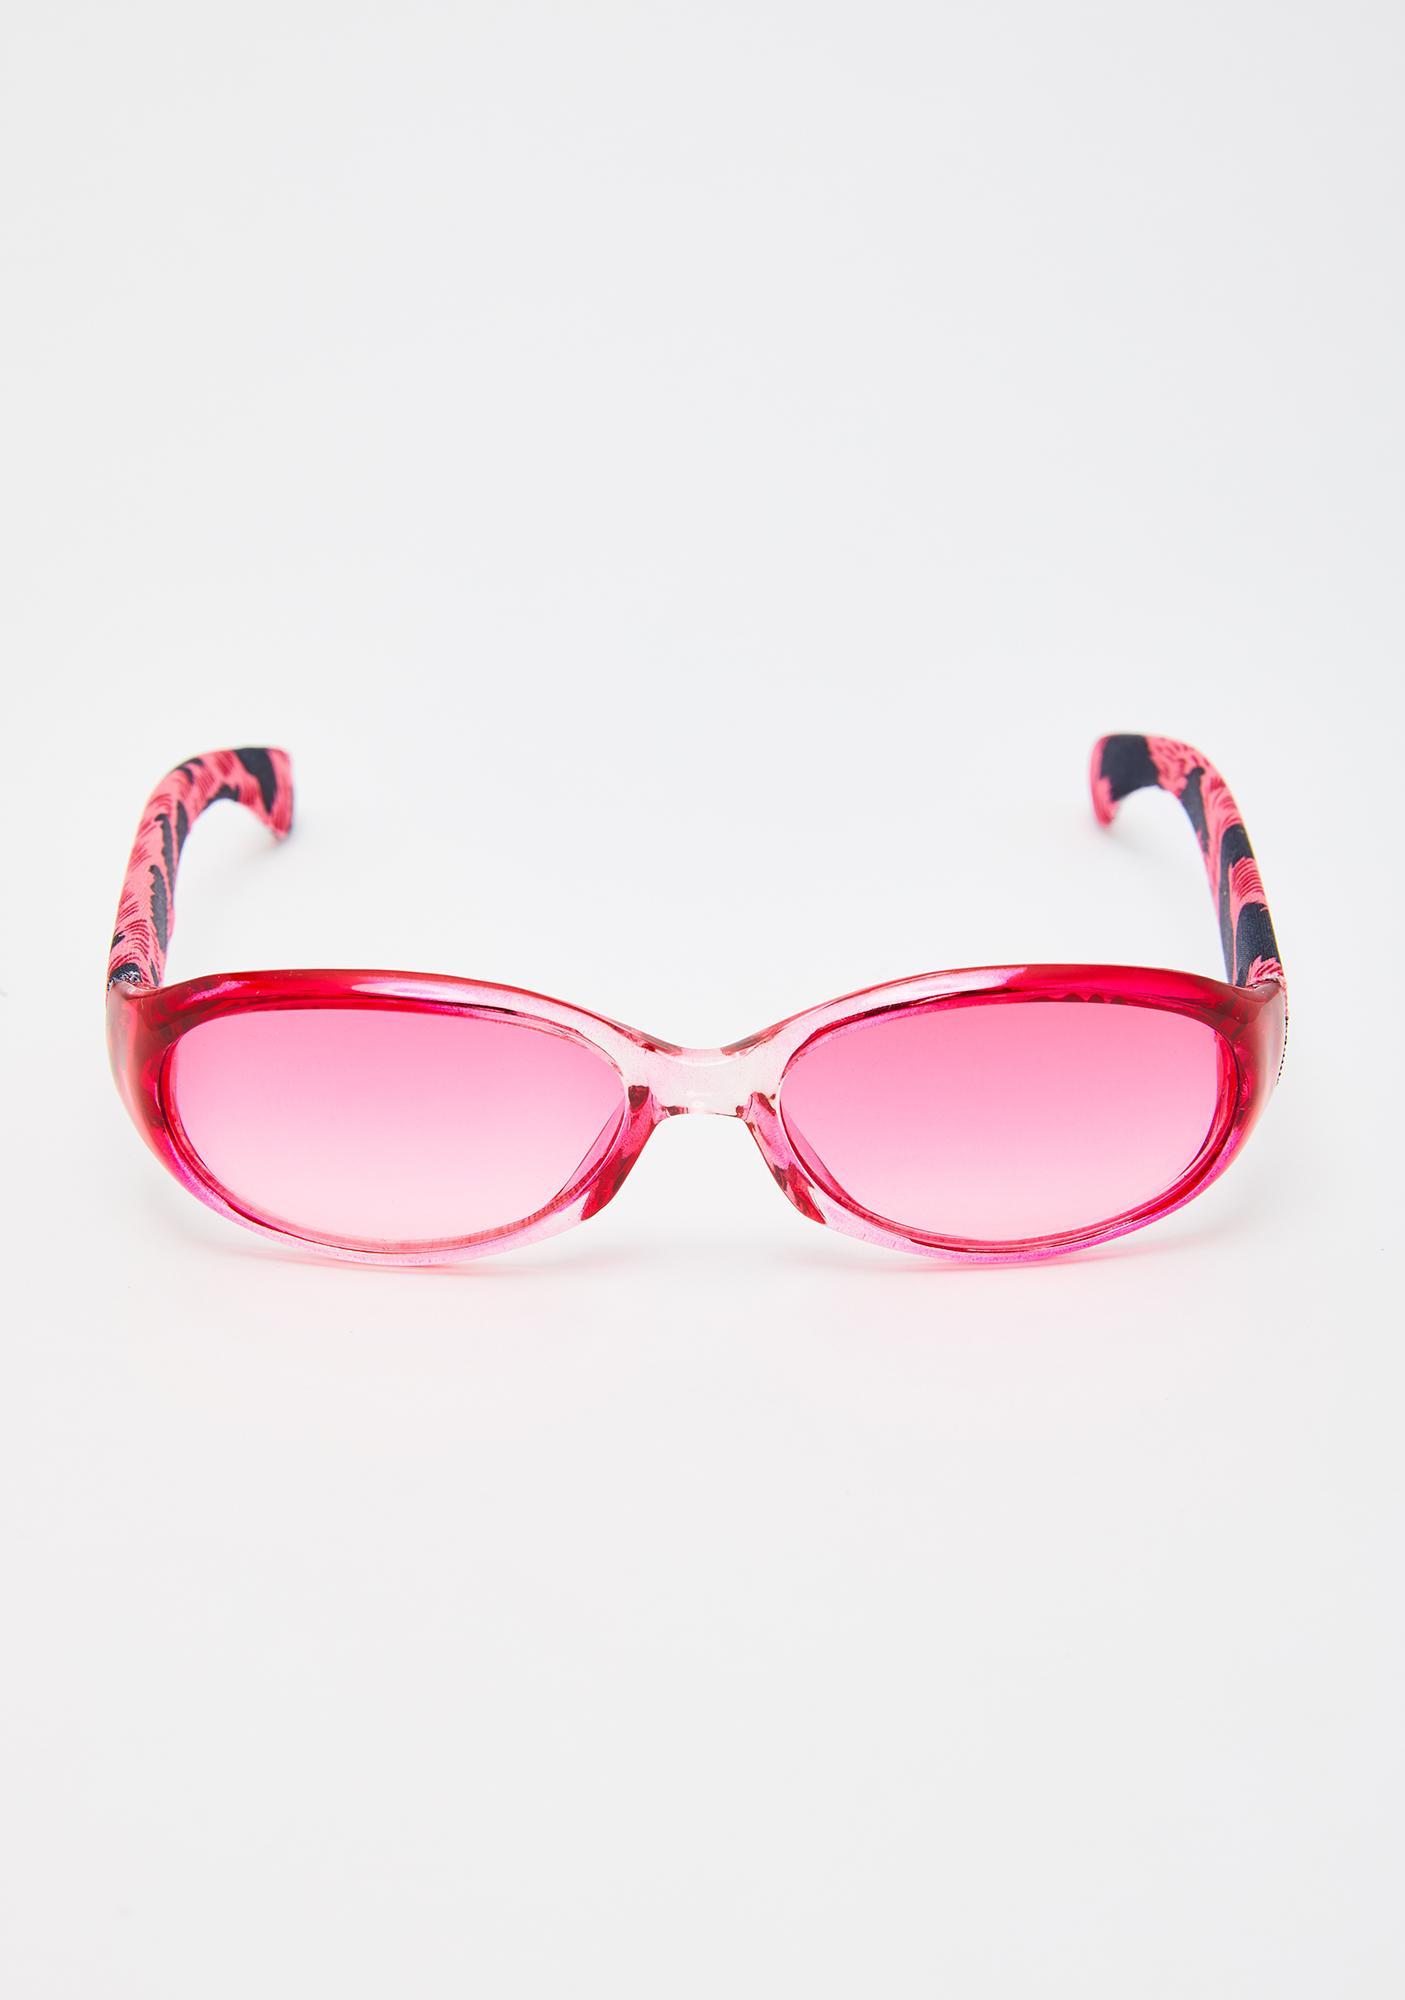 Giant Vintage Jane's Sunglasses